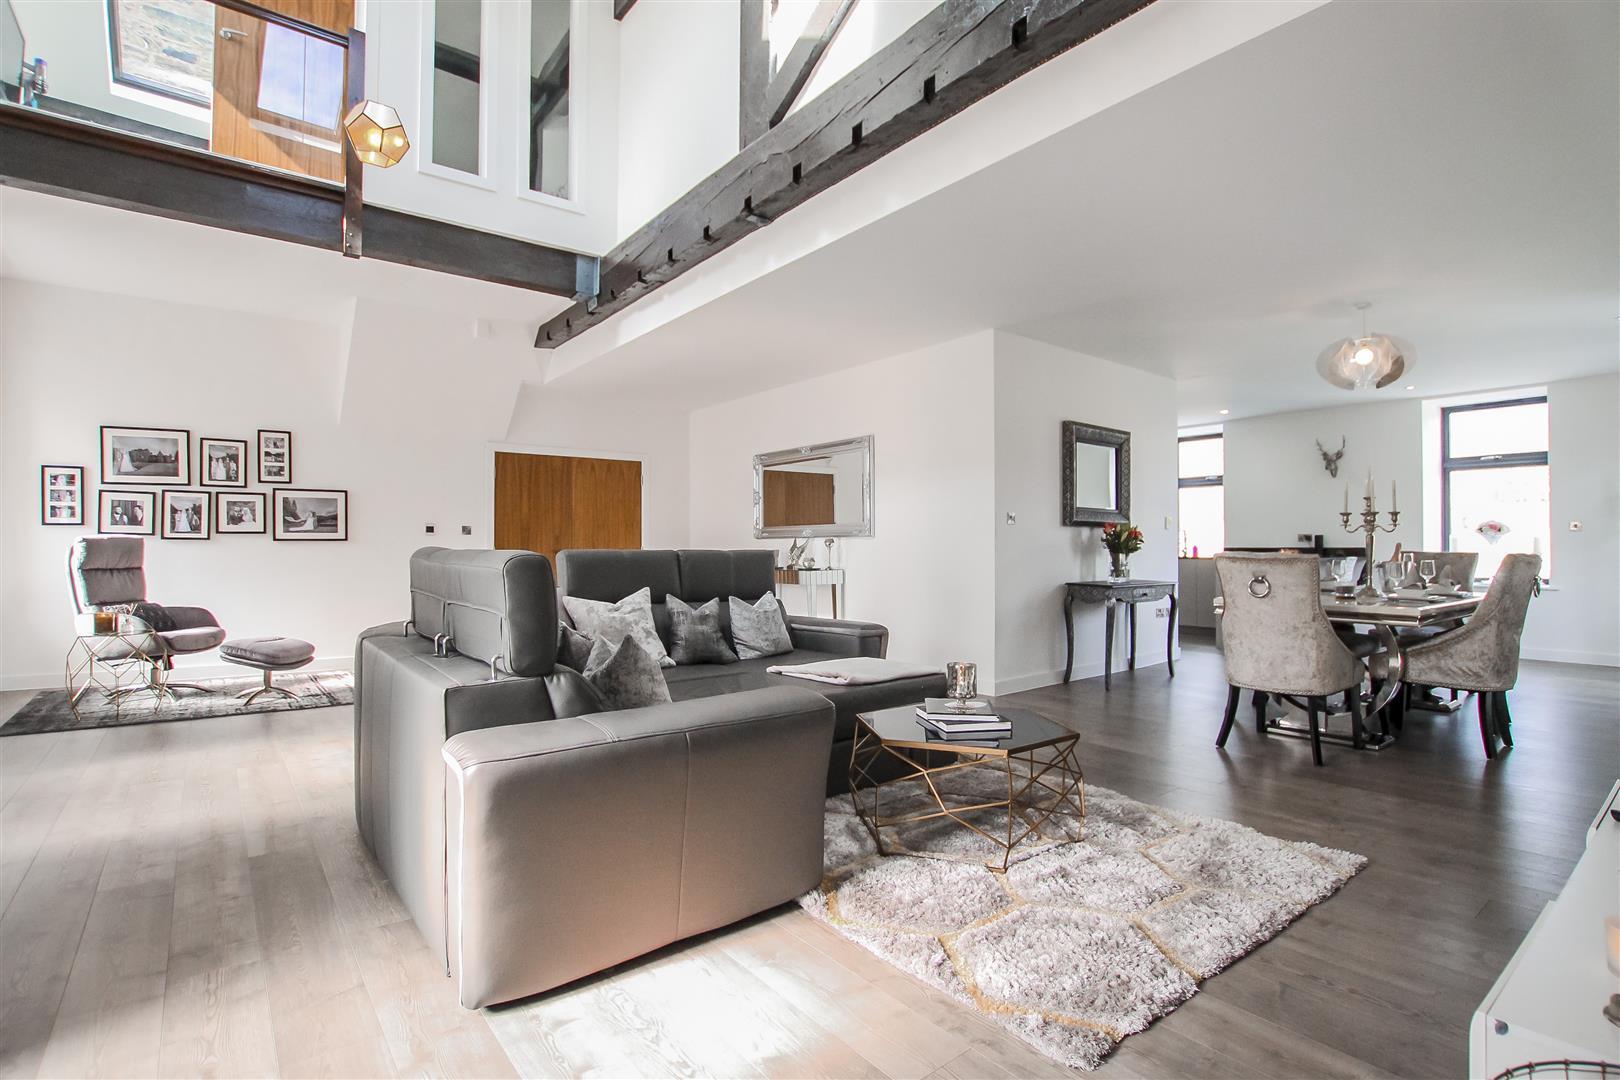 3 Bedroom Duplex Apartment For Sale - Main Image